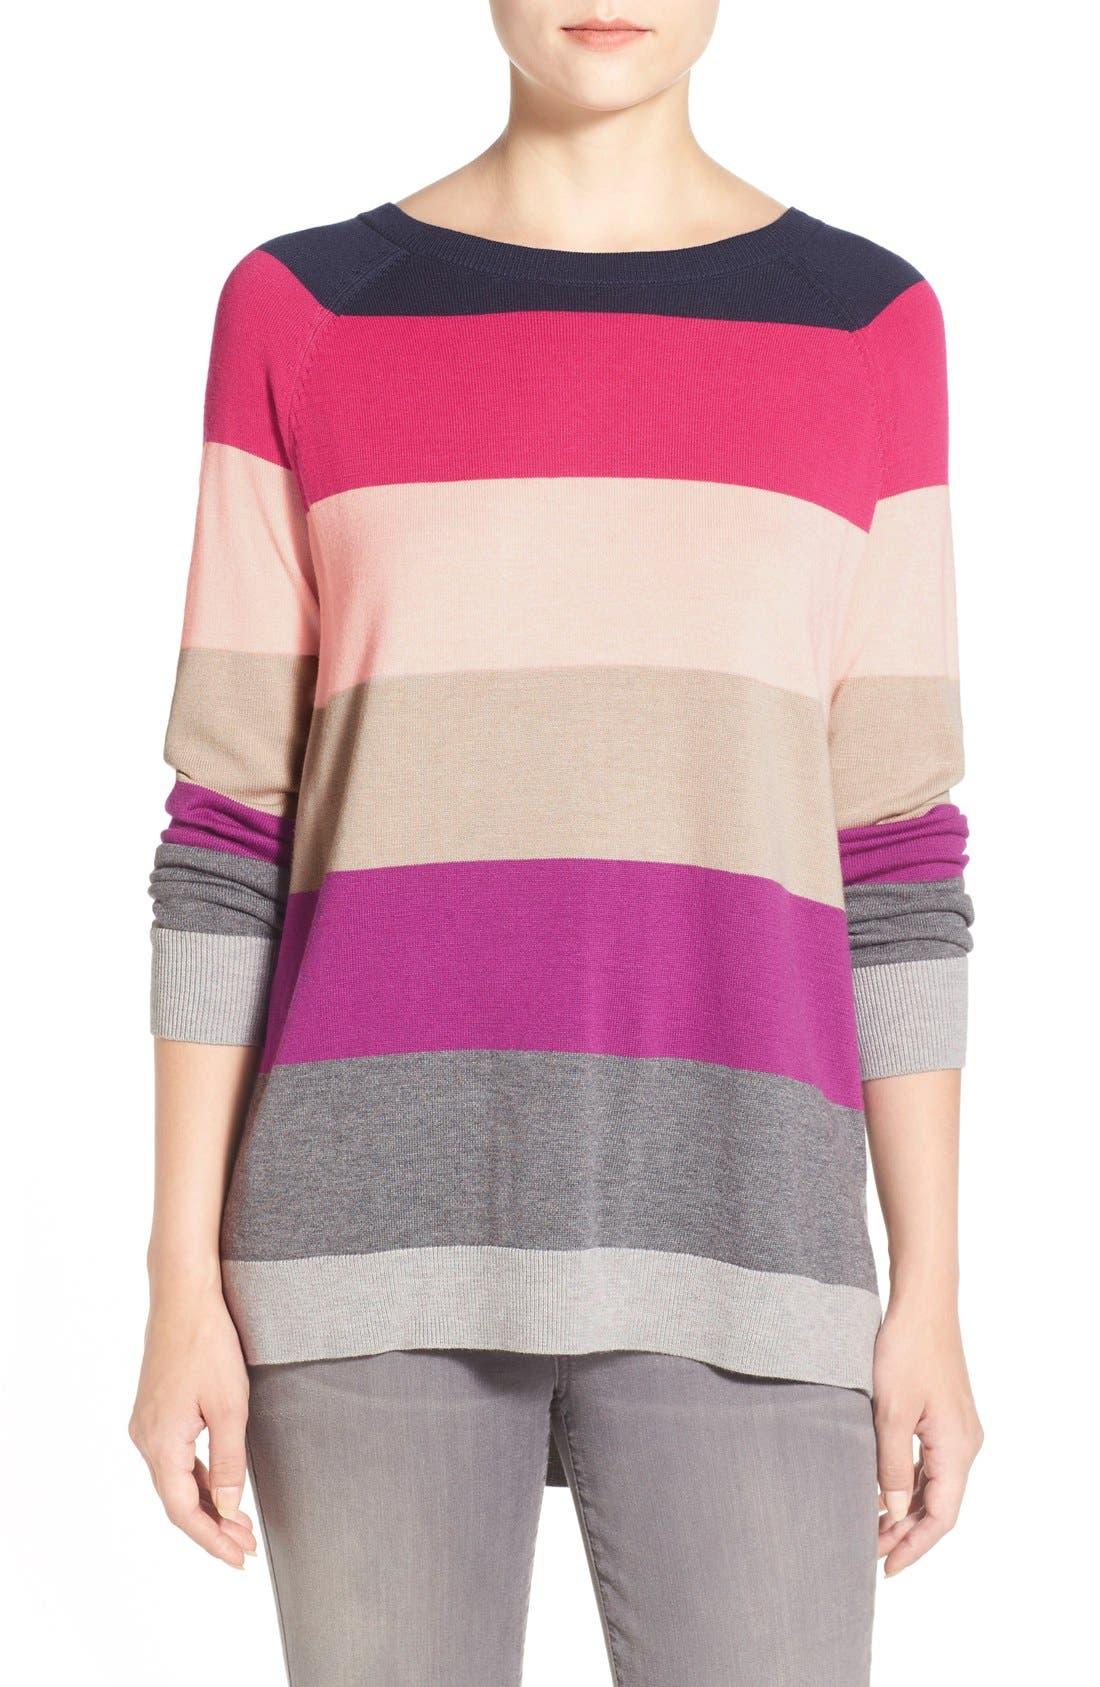 Alternate Image 1 Selected - Caslon® Raglan Crewneck Sweater (Regular & Petite)